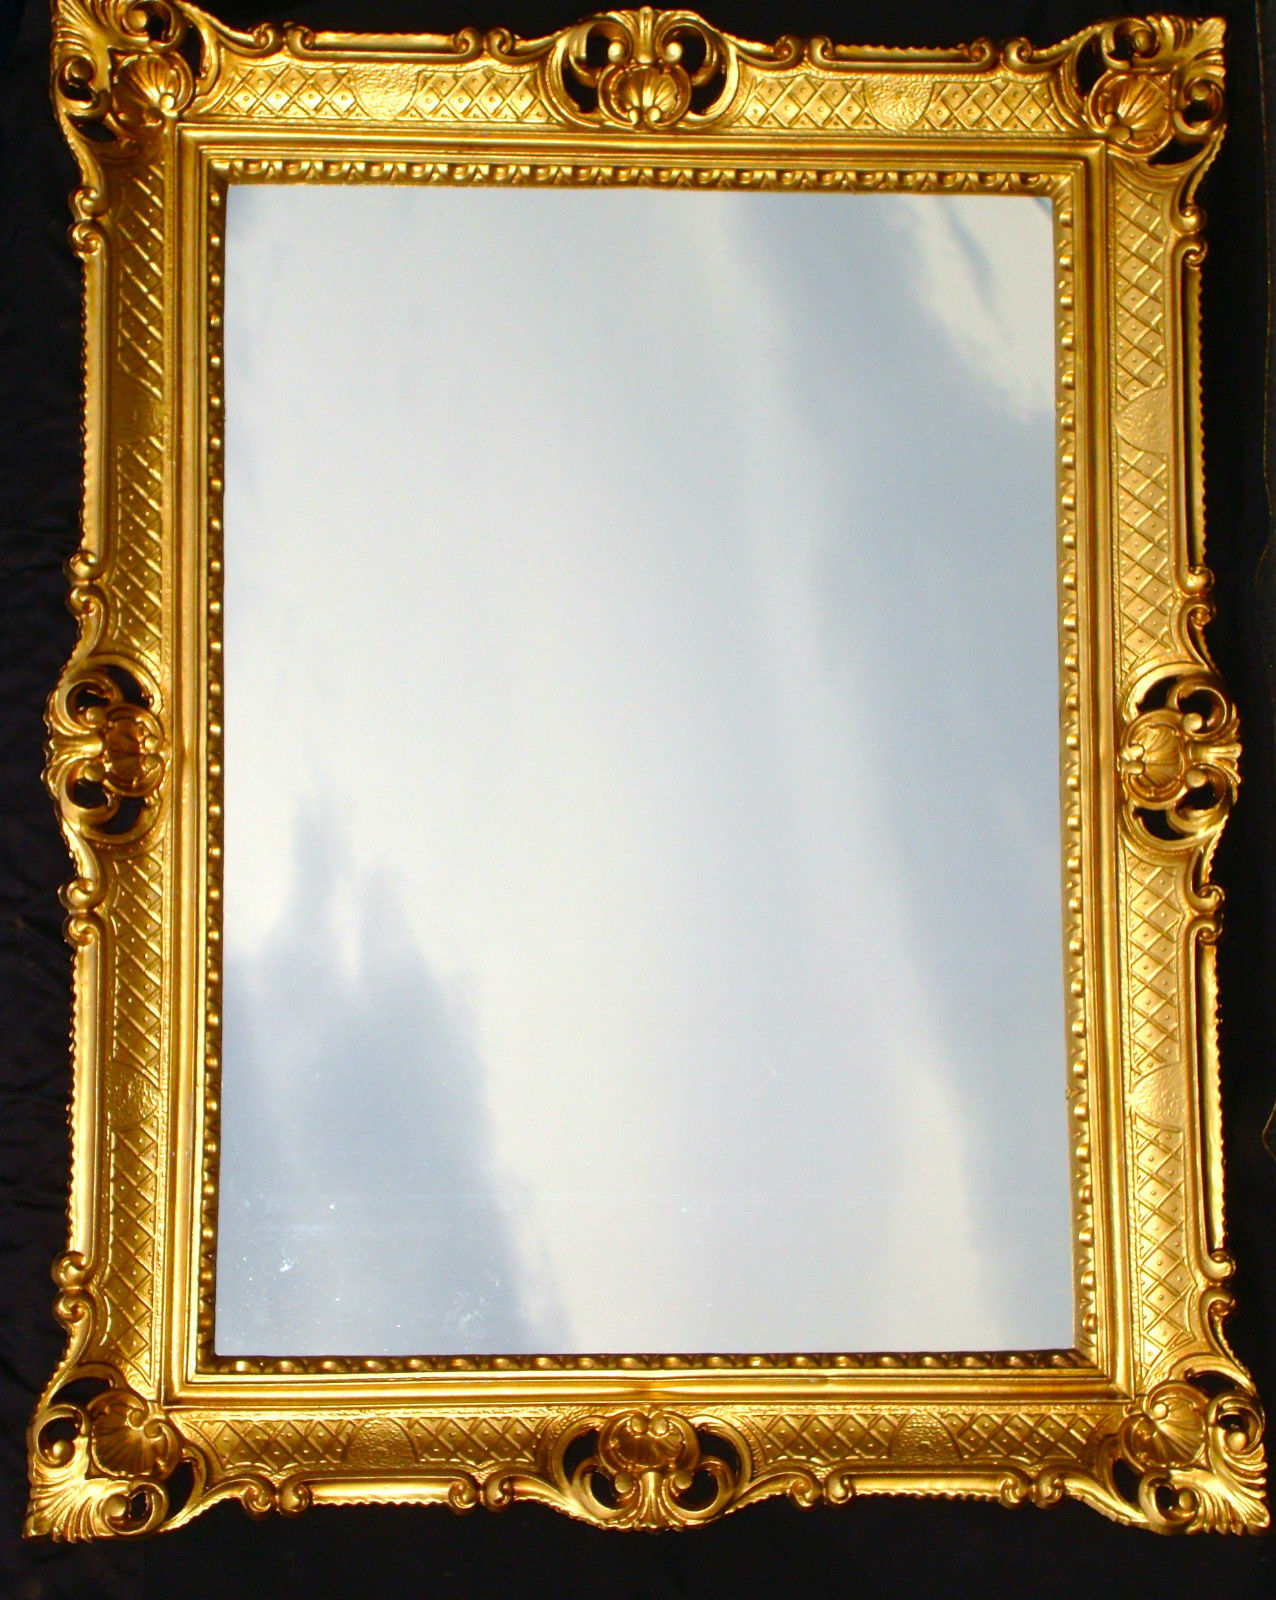 wandspiegel gold barock wandspiegel antik barock rokoko stil gold edel luxus prunk spiegel. Black Bedroom Furniture Sets. Home Design Ideas